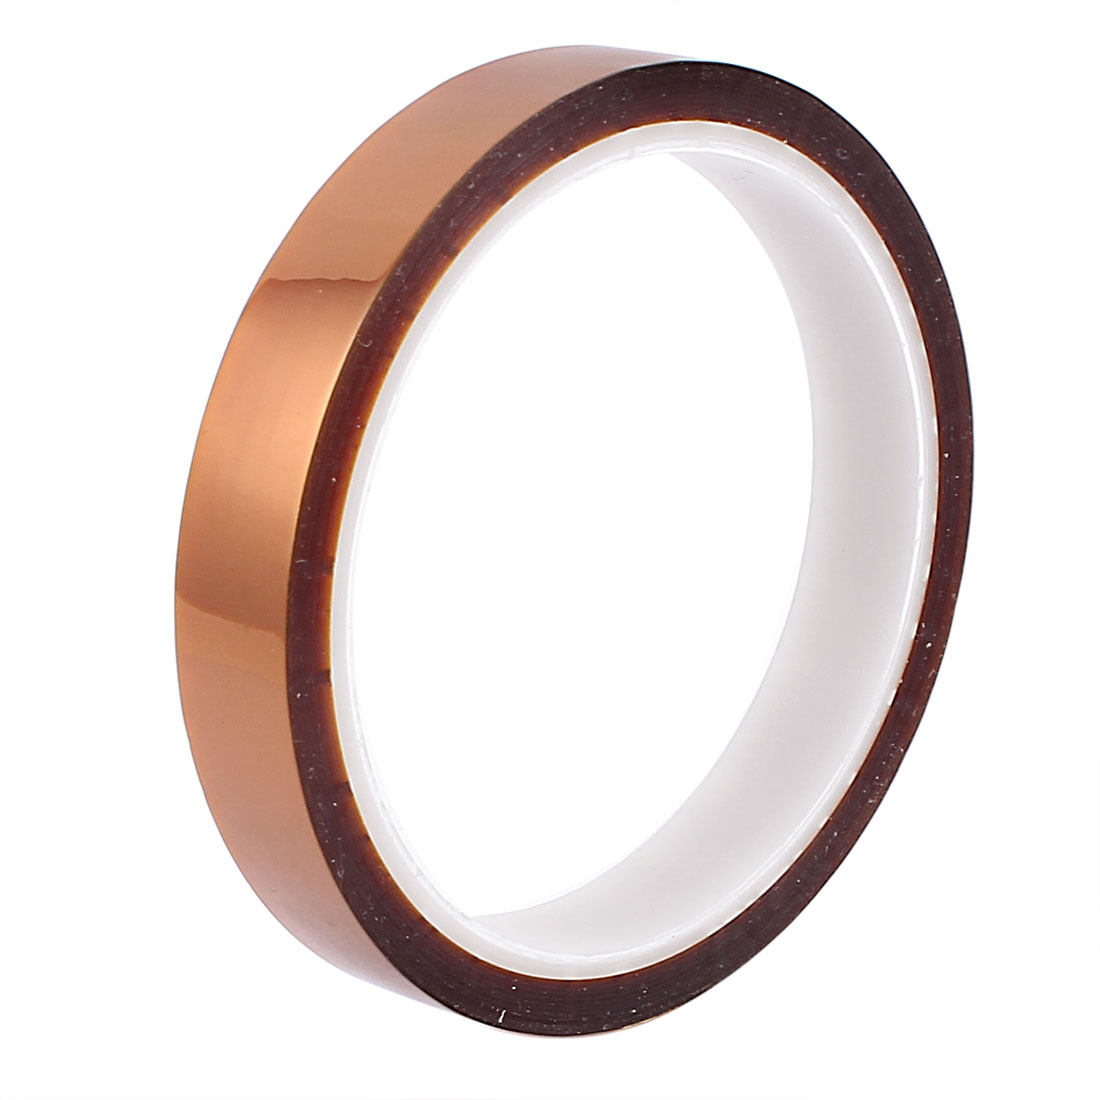 15mm Width 93mm Diameter High Temperature Resistant Tape